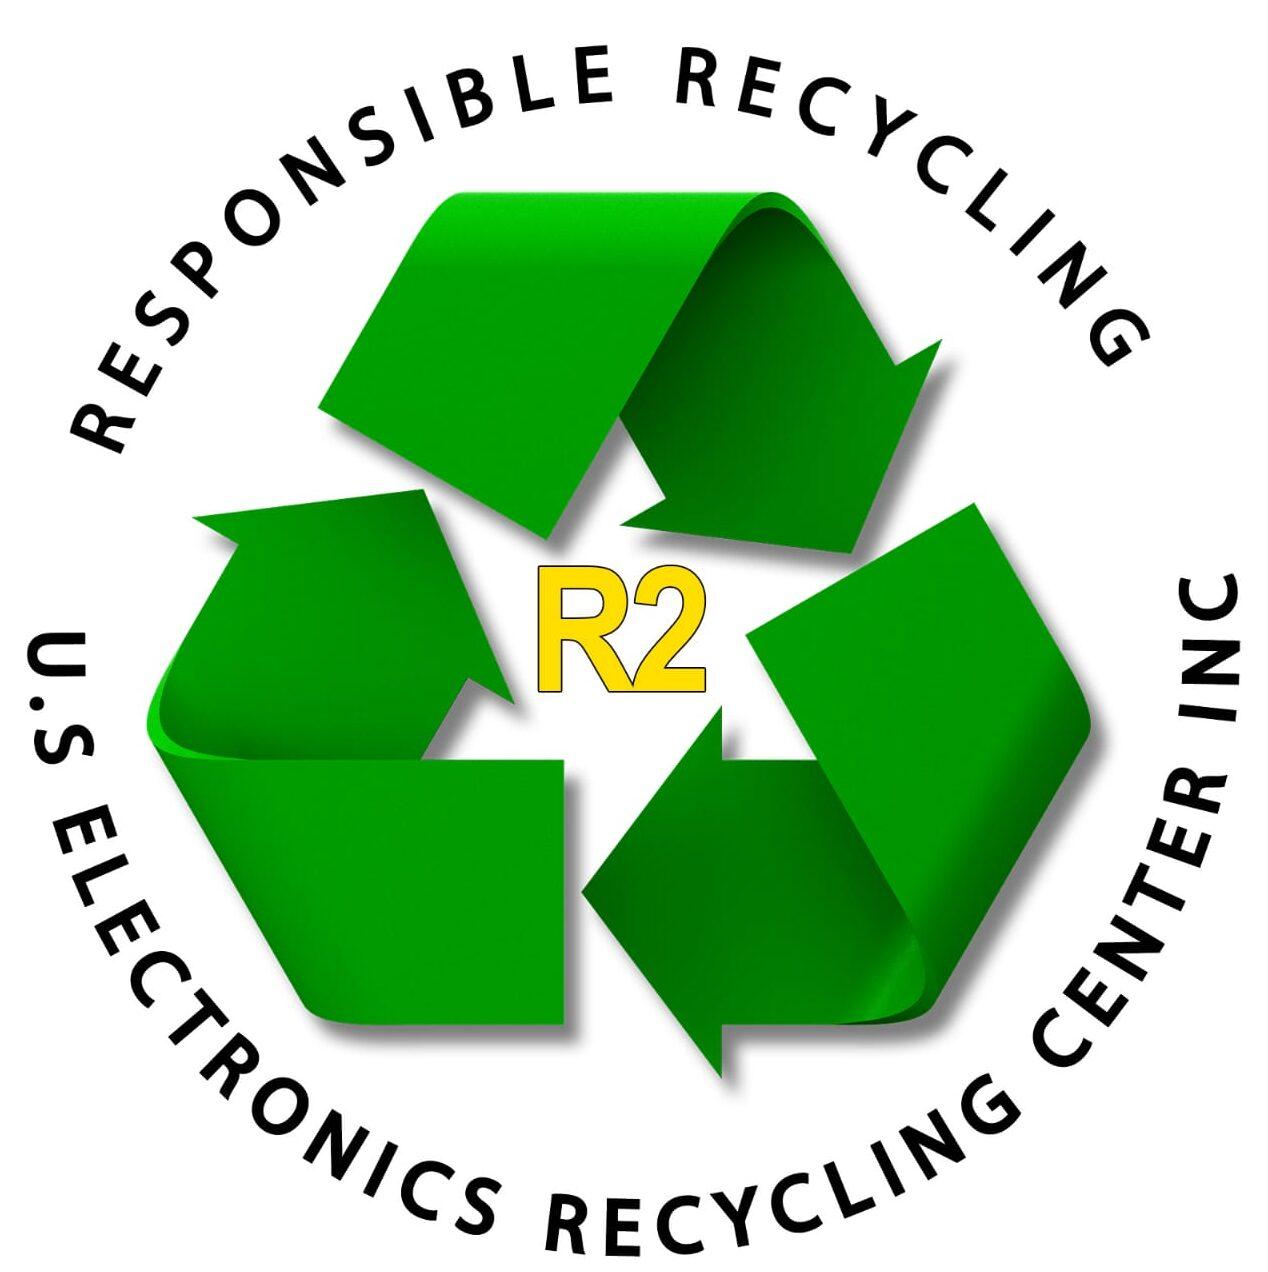 U.S ELECTRONICS RECYCLING CENTER HOUSTON TEXAS | BEST ELECTRONICS RECYCLING CENTER IN TEXAS | E-WASTE RECYCLING